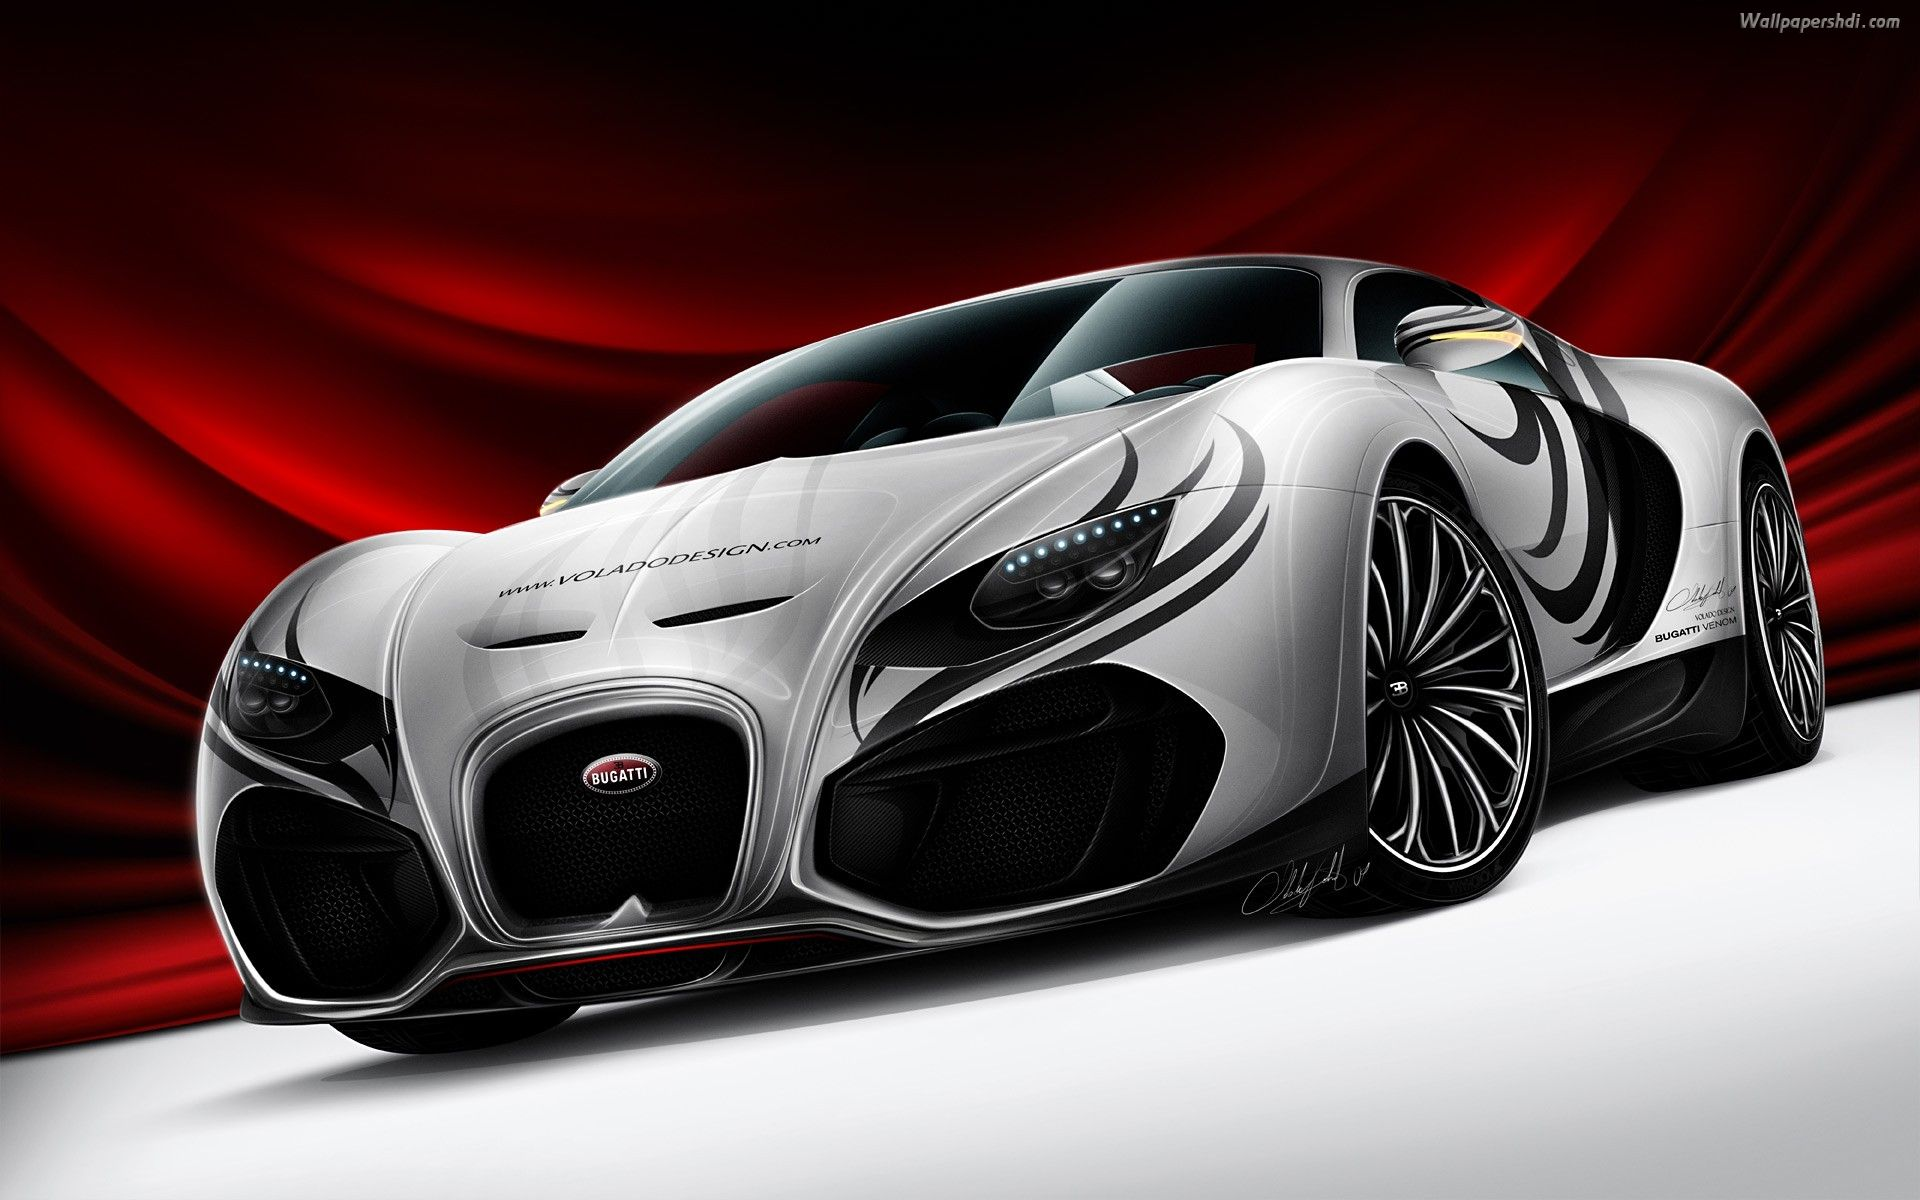 713ac64d87a96737269662504c3b208b Exciting Bugatti Veyron New Model 2015 Cars Trend